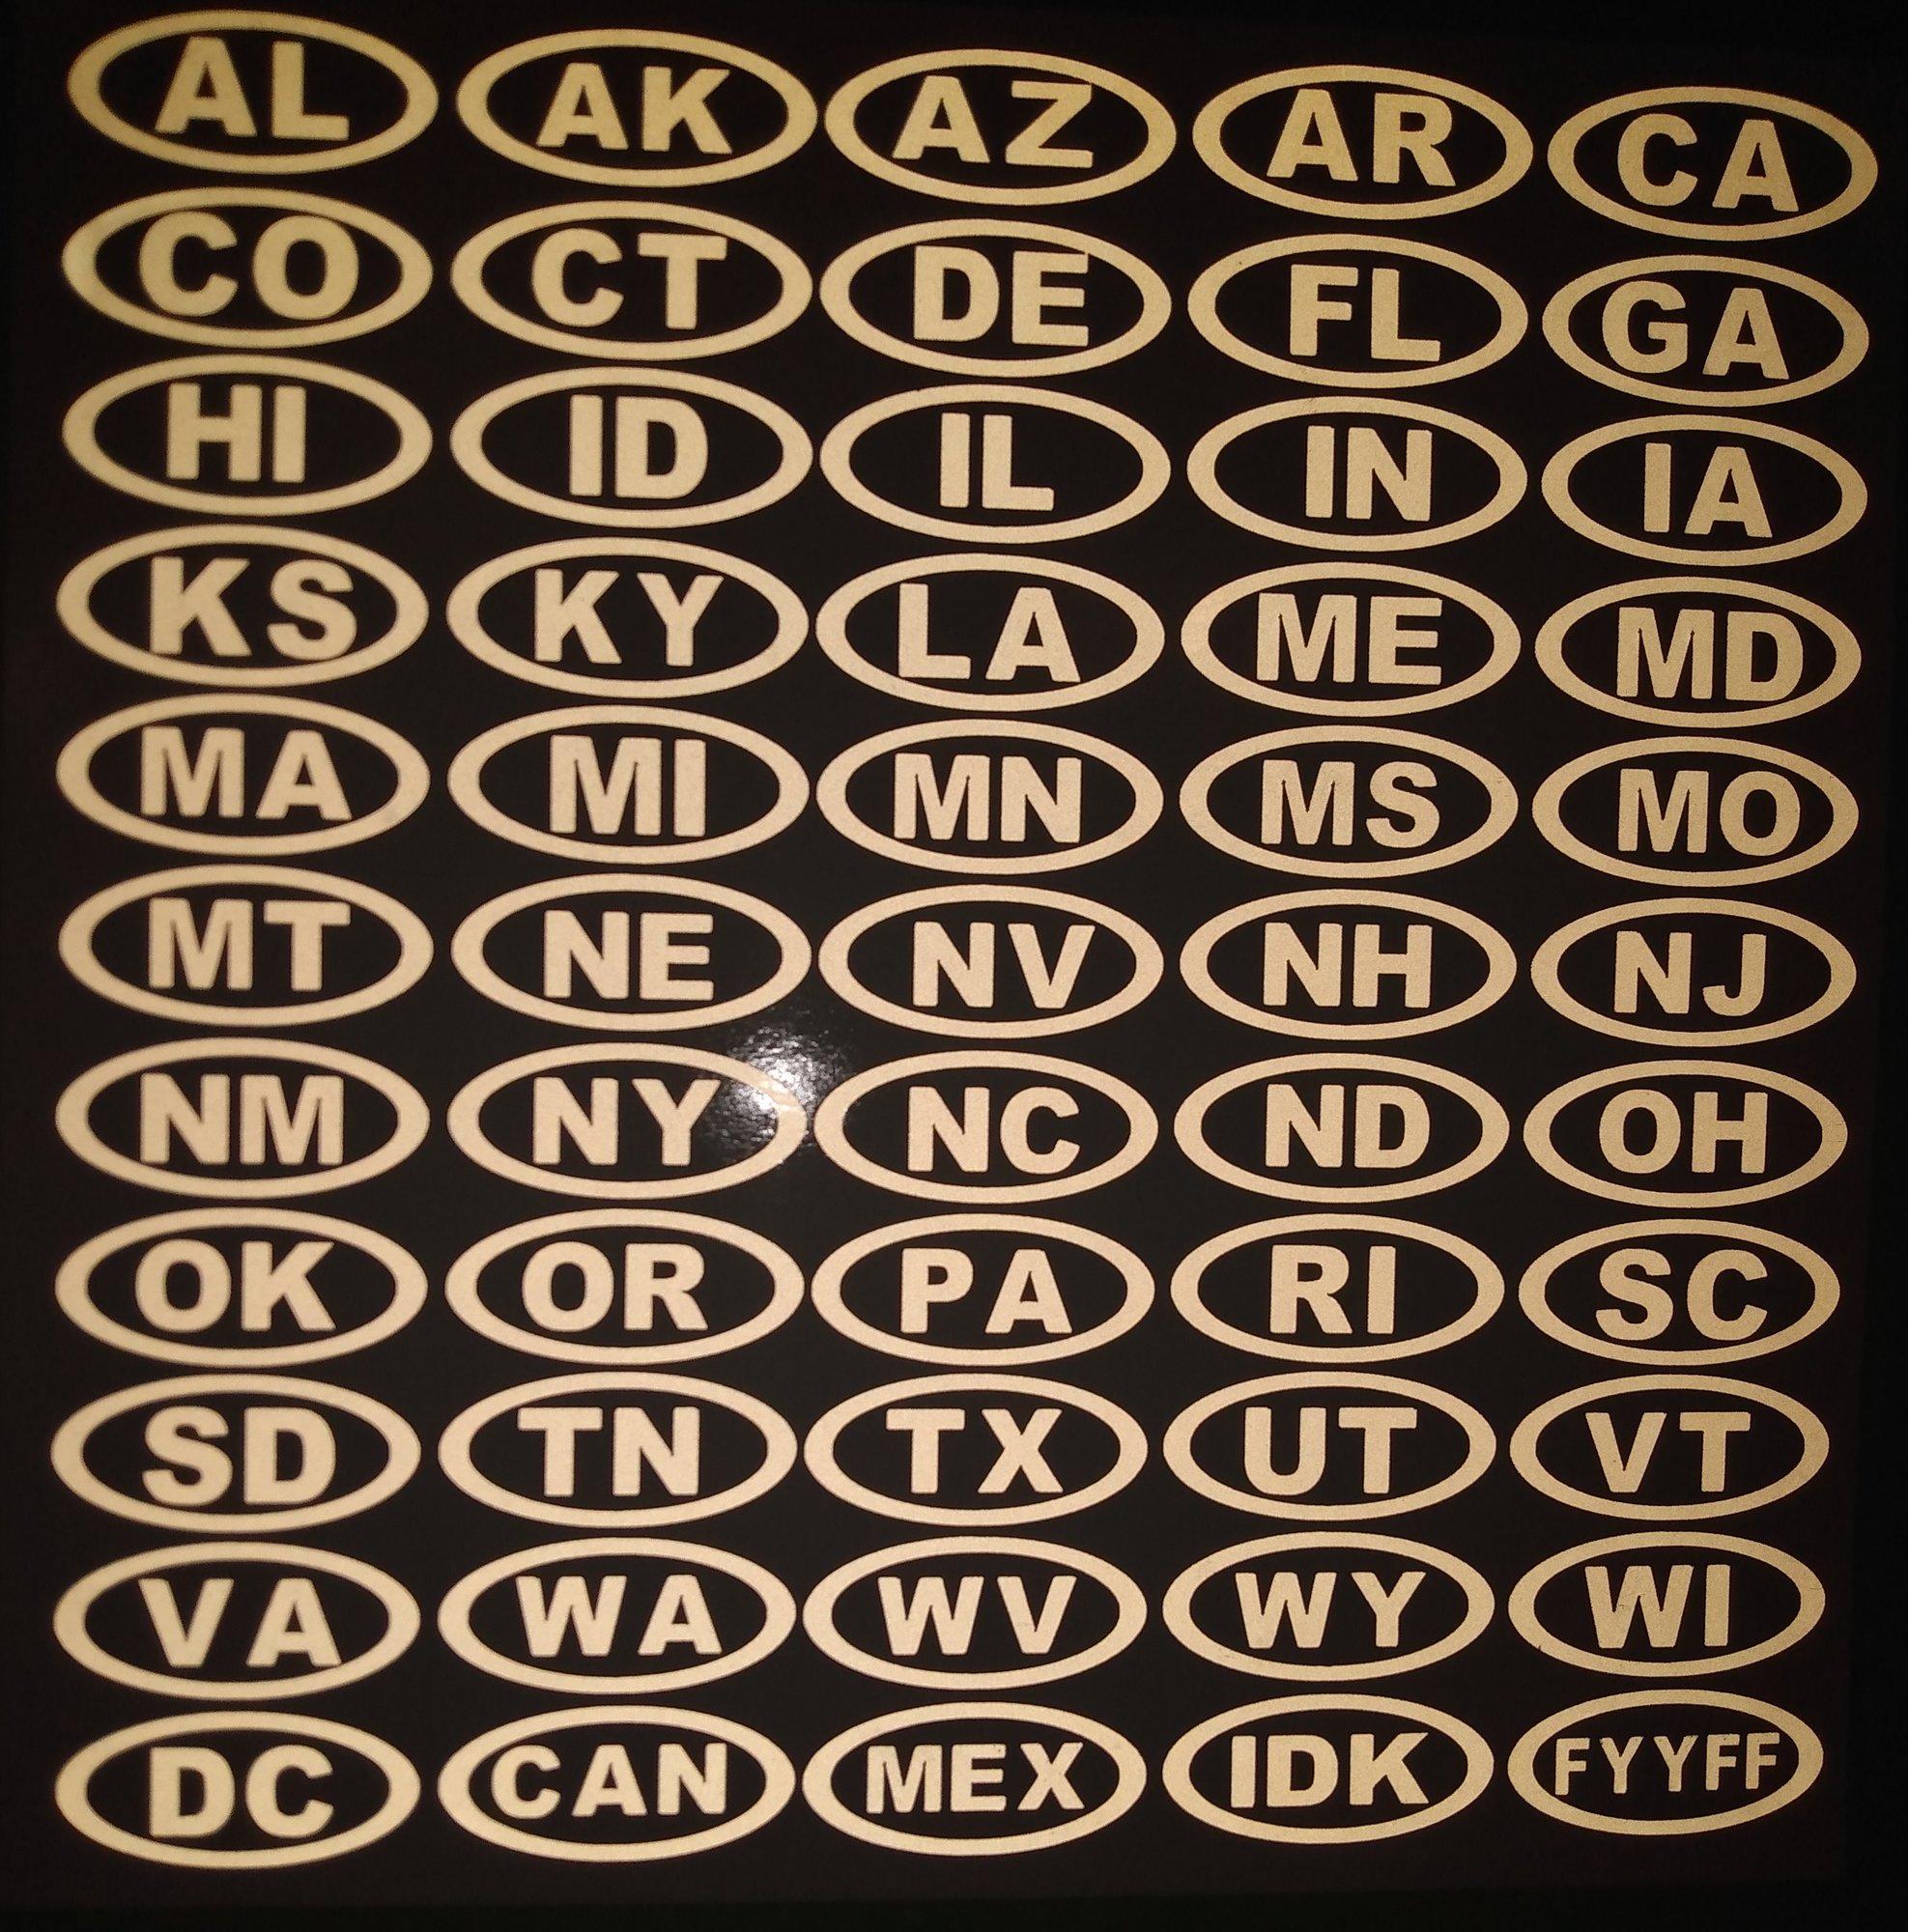 ADV_Stickers_a.jpg